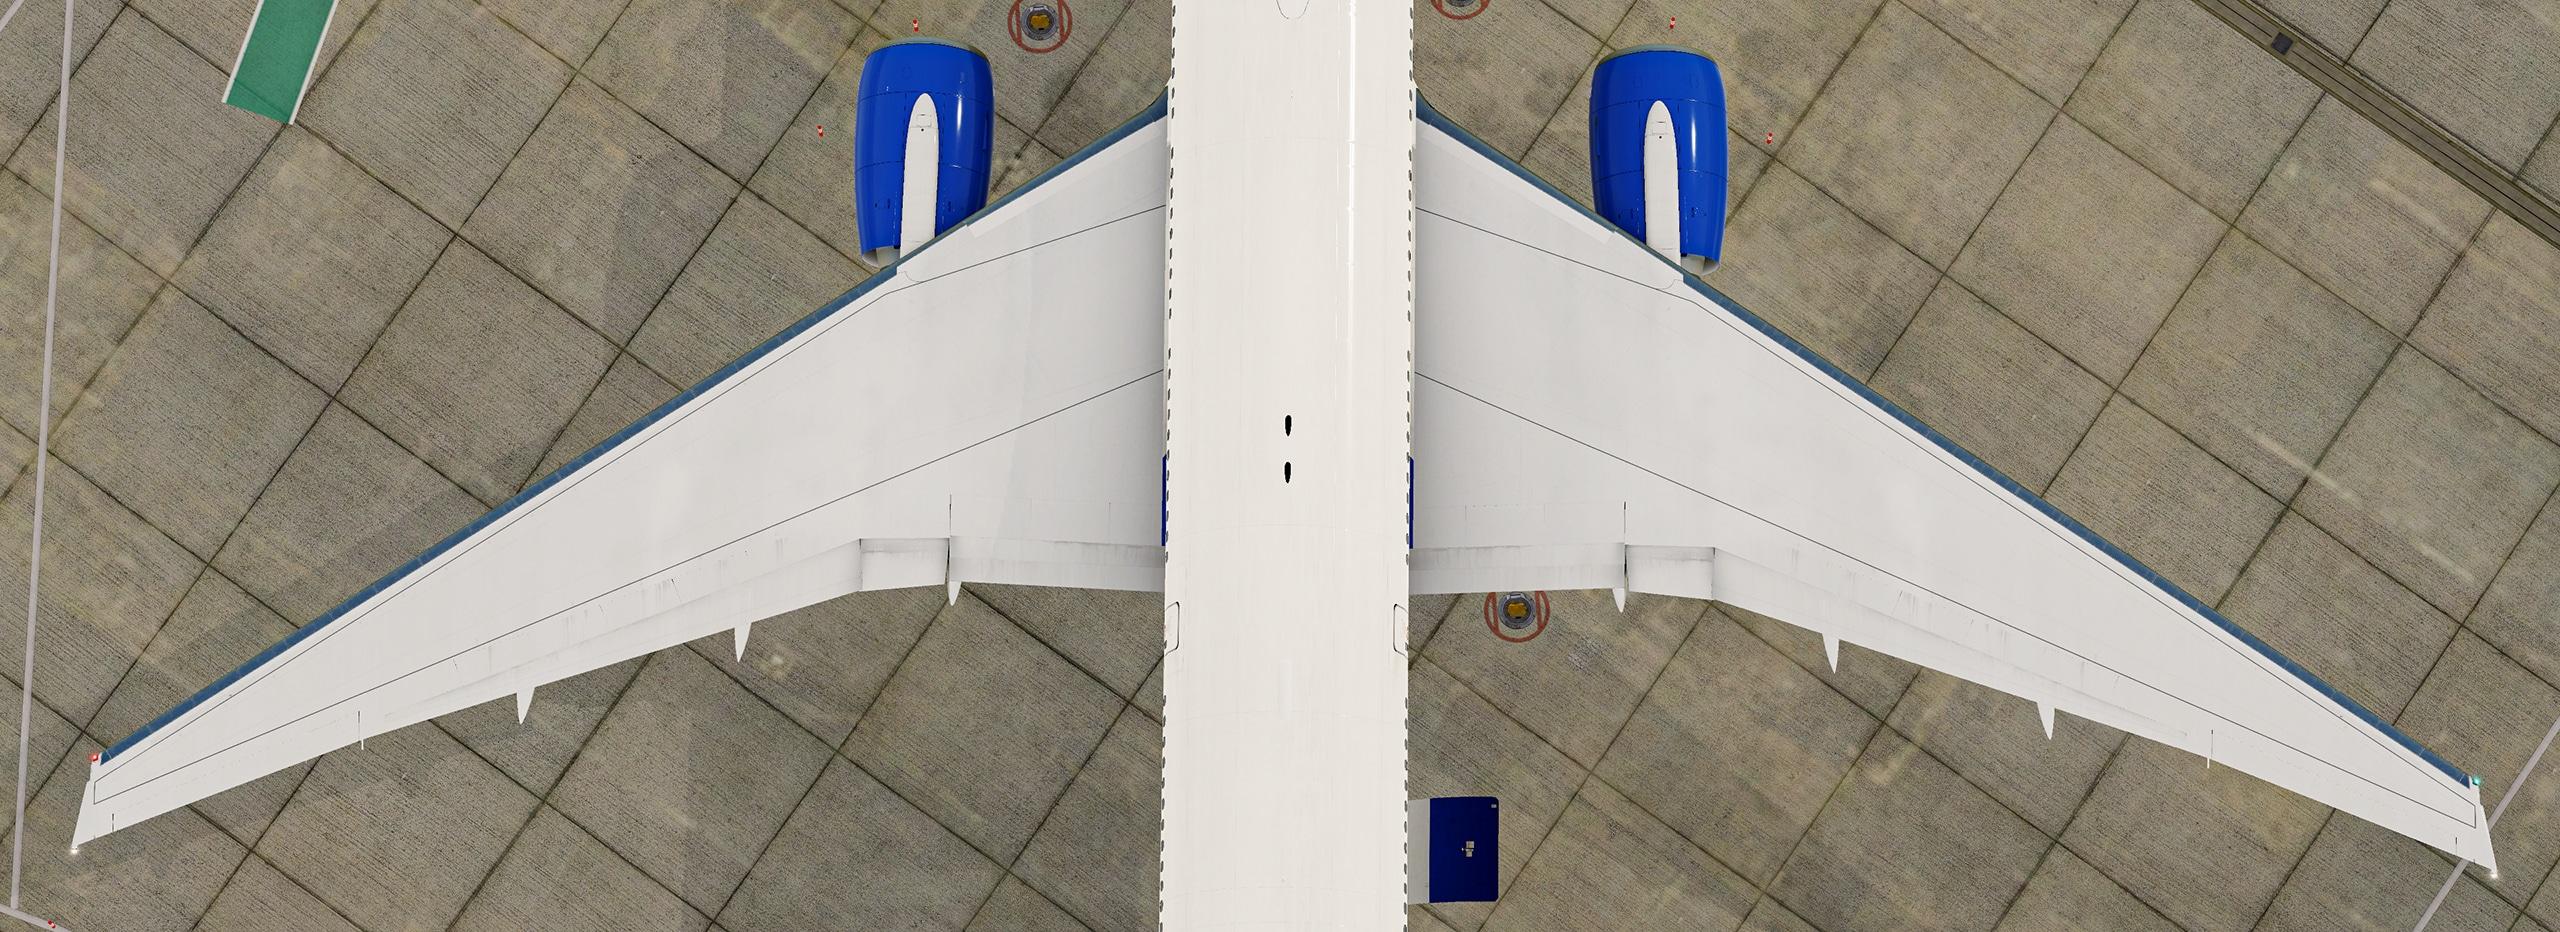 777-200ER